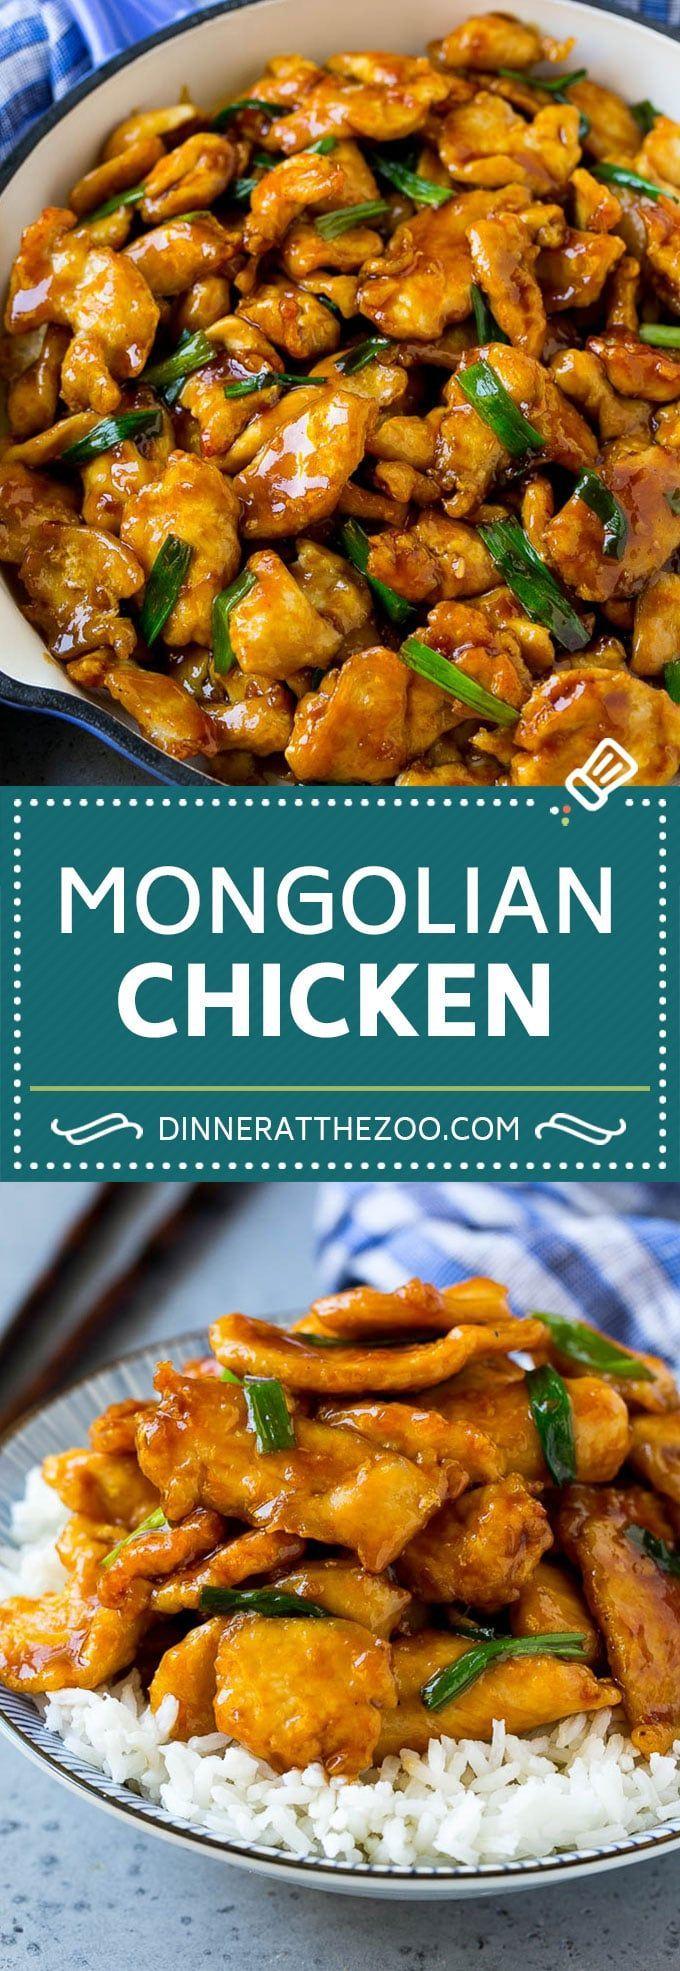 Photo of Mongolian Chicken